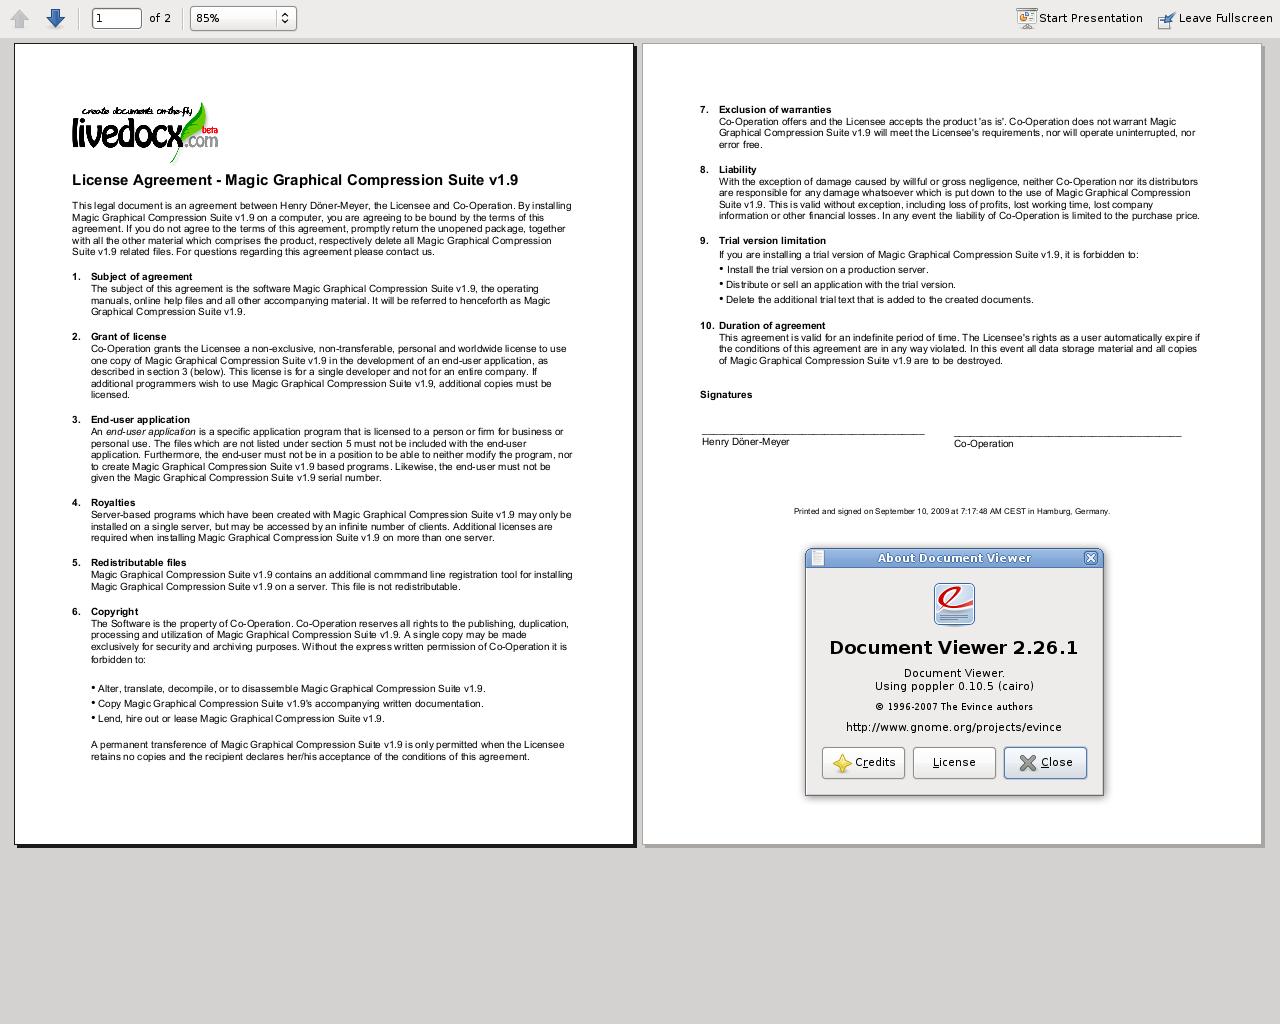 zendservice livedocx zend framework 2 2 1 6 documentation